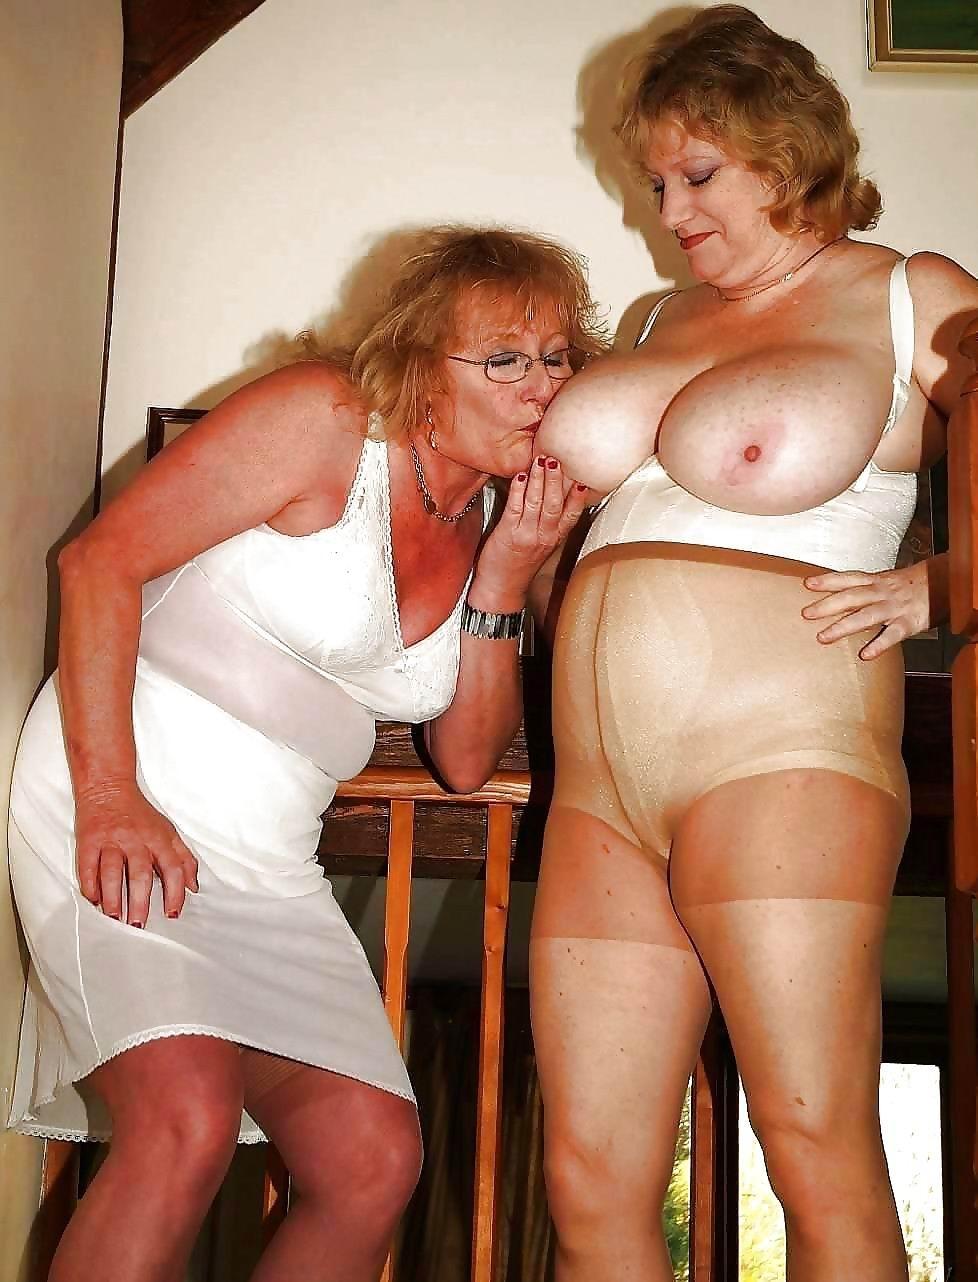 Granny bra sex